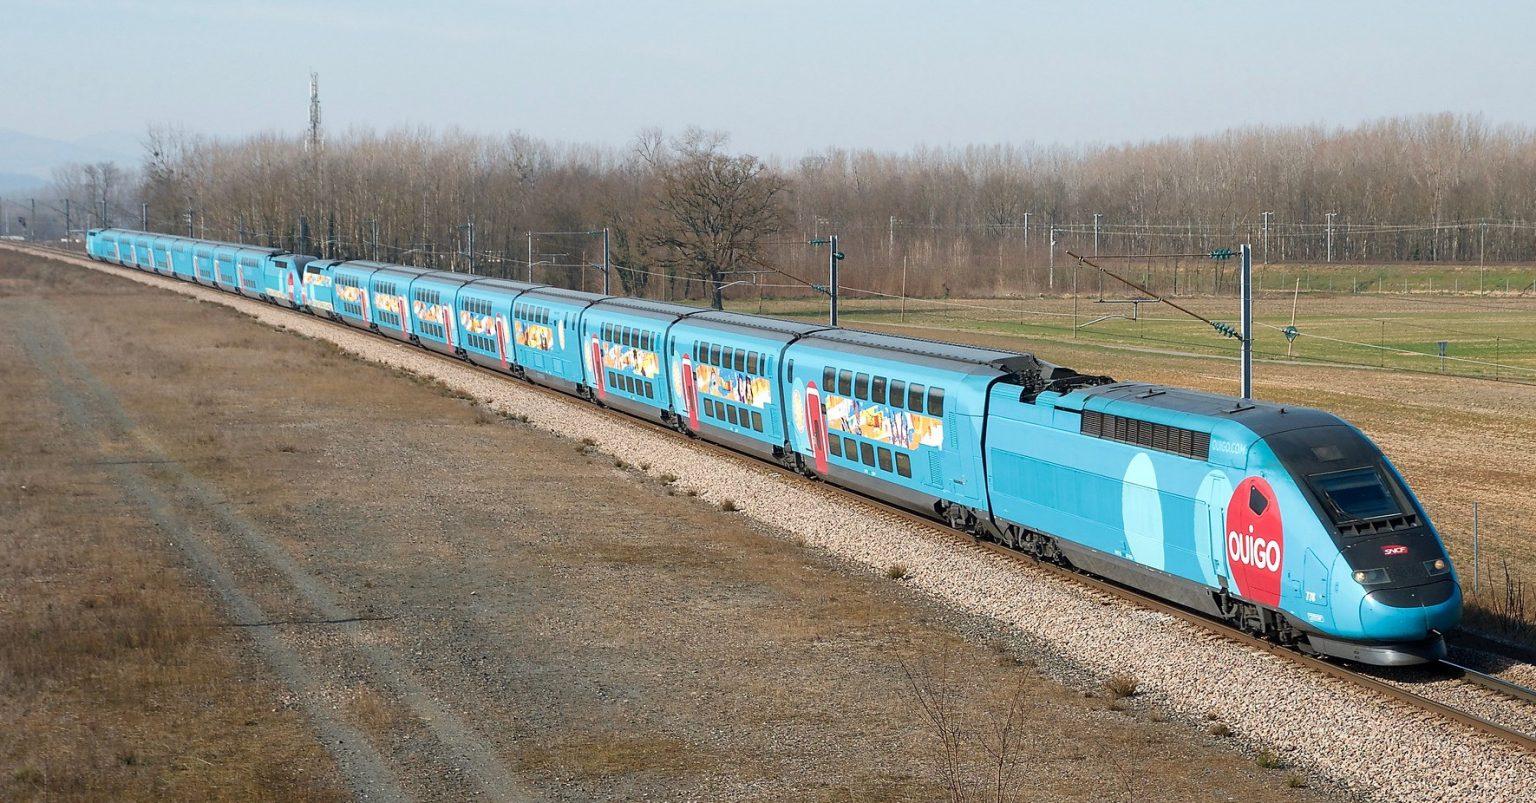 Tren Ouigo de SNCF, servicio en el que se basará el Falbalá de Rielsfera. Foto (CC BY NC SA): Sylvain Bouard